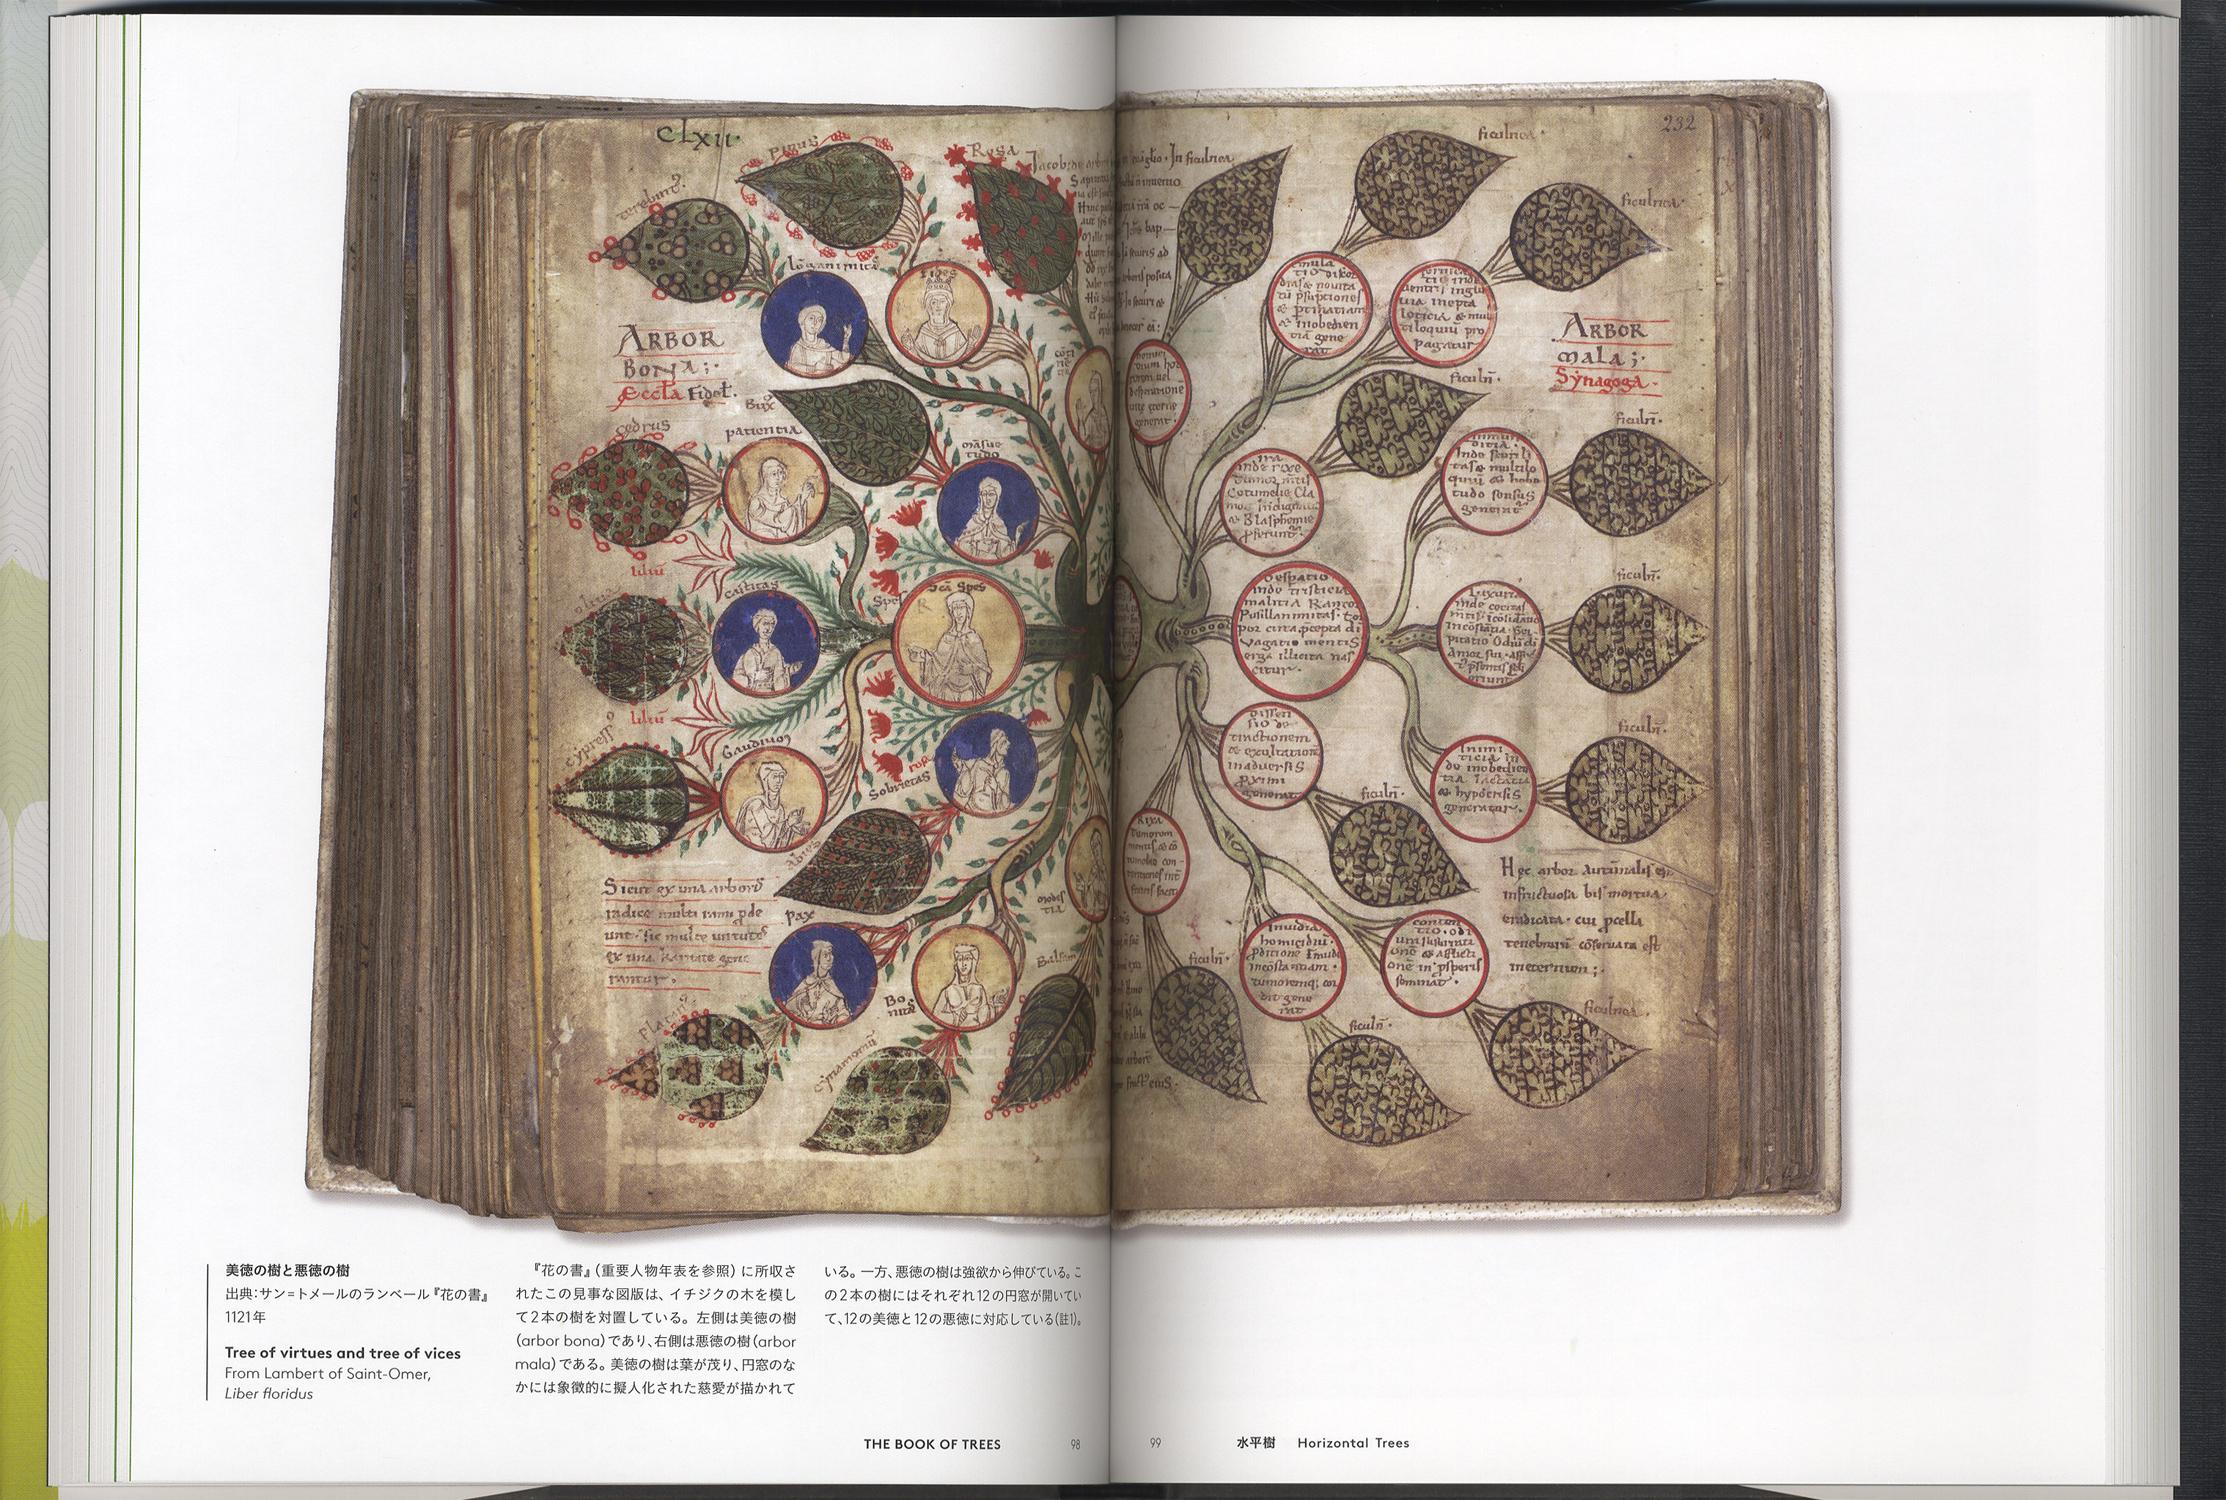 THE BOOK OF TREES 系統樹大全:知の世界を可視化するインフォグラフィックス[image5]